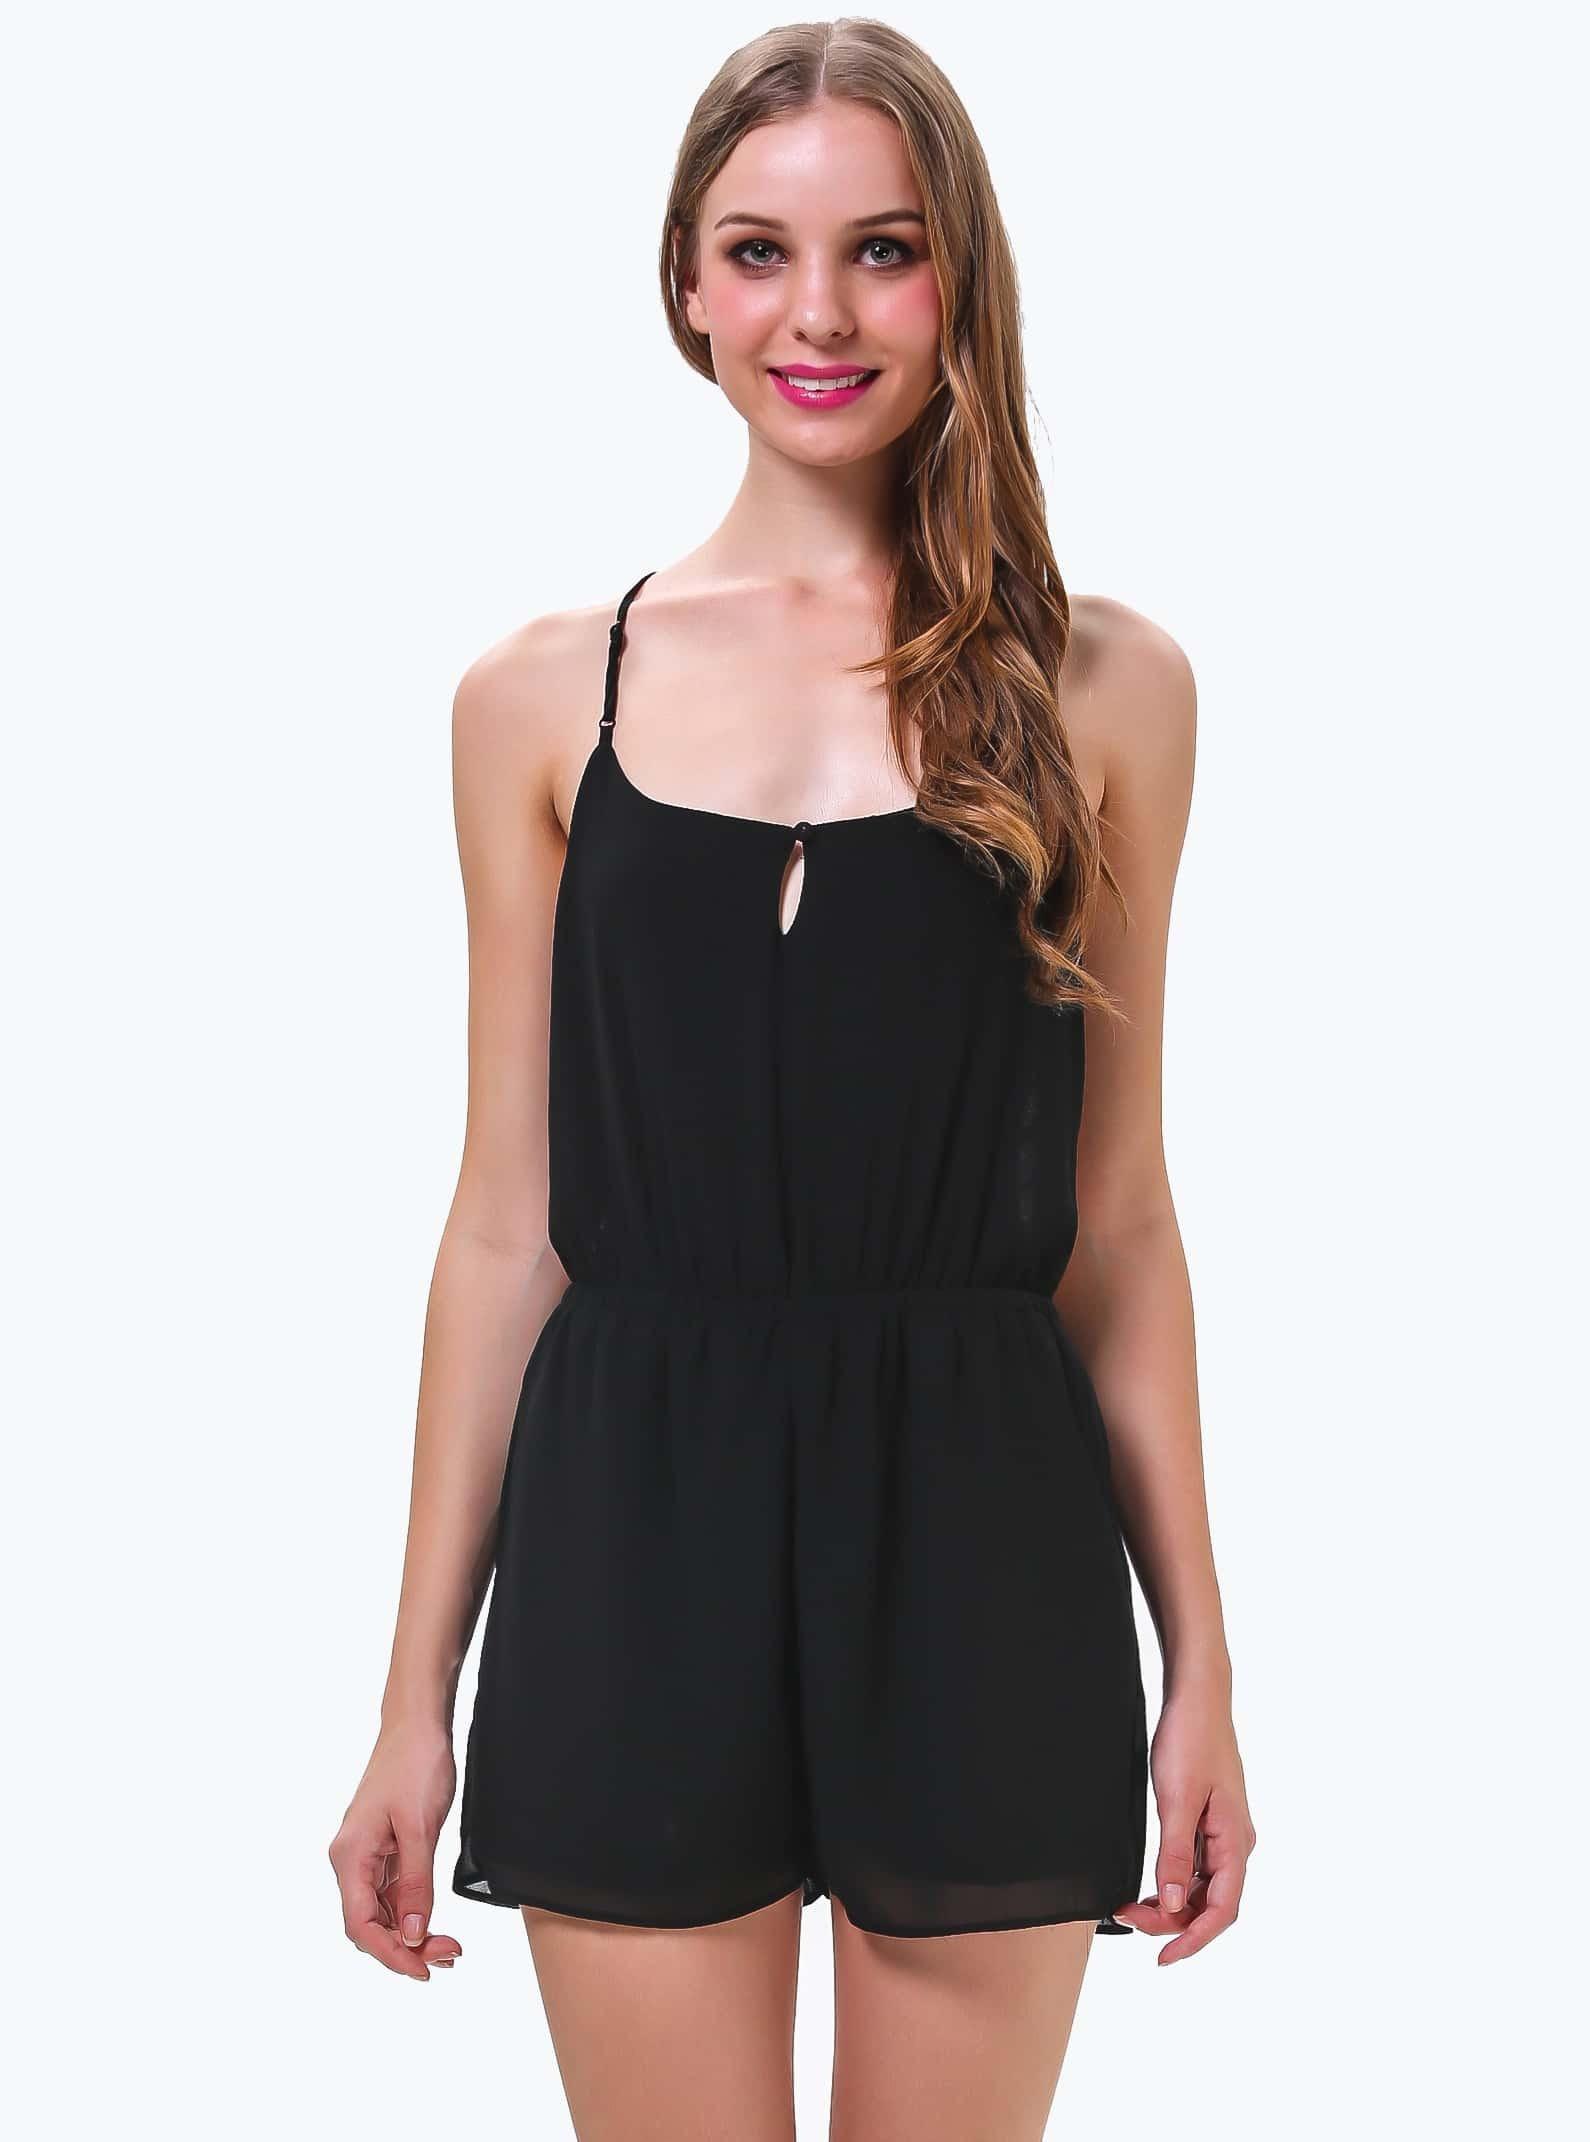 Los spaghetti strap backless plain sleeveless jumpsuits online